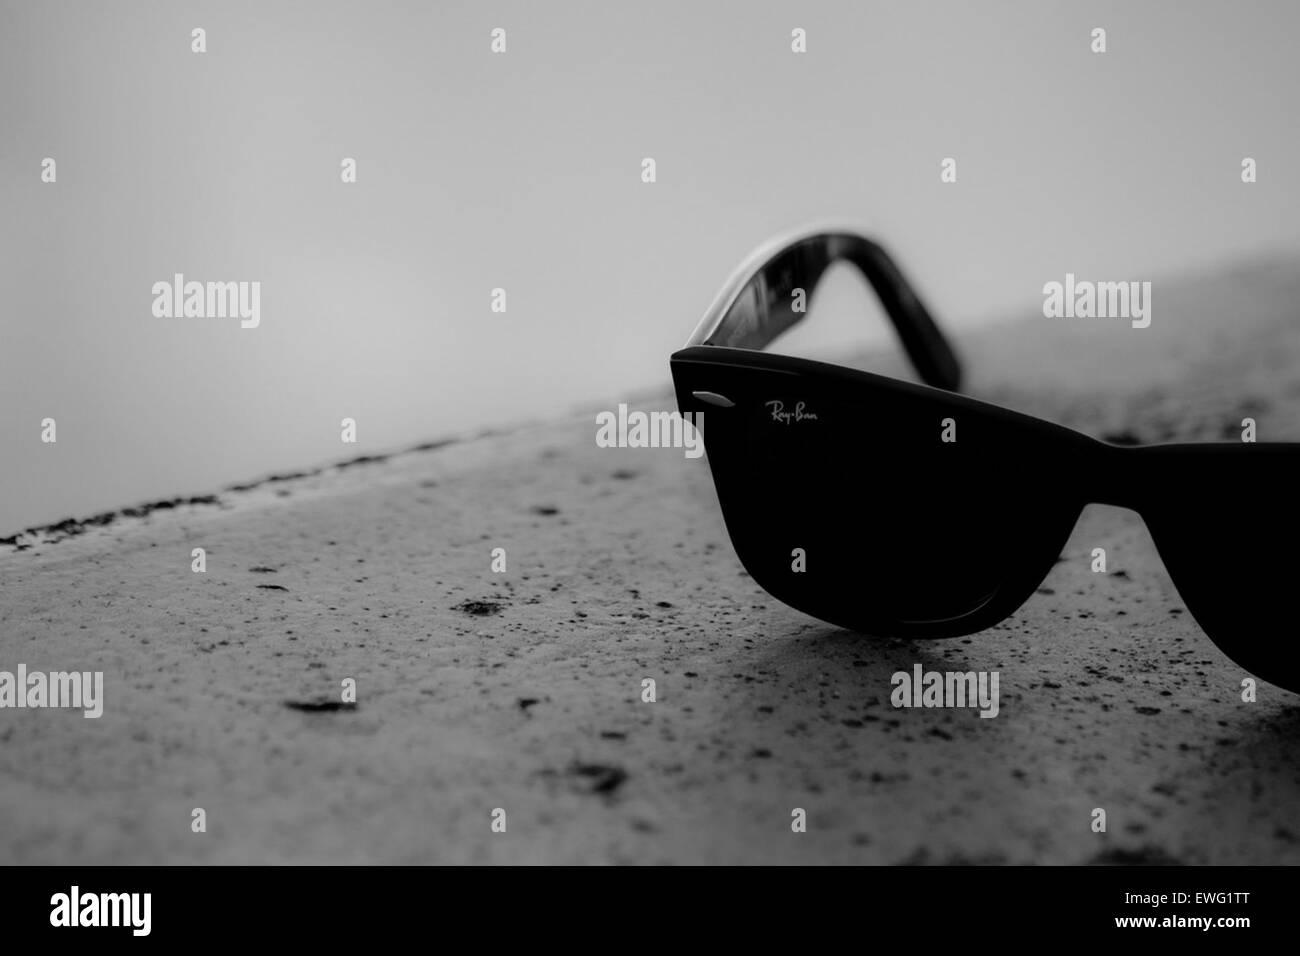 Soleil Lunettes Ray De Ban Photosamp; Nnm80vw